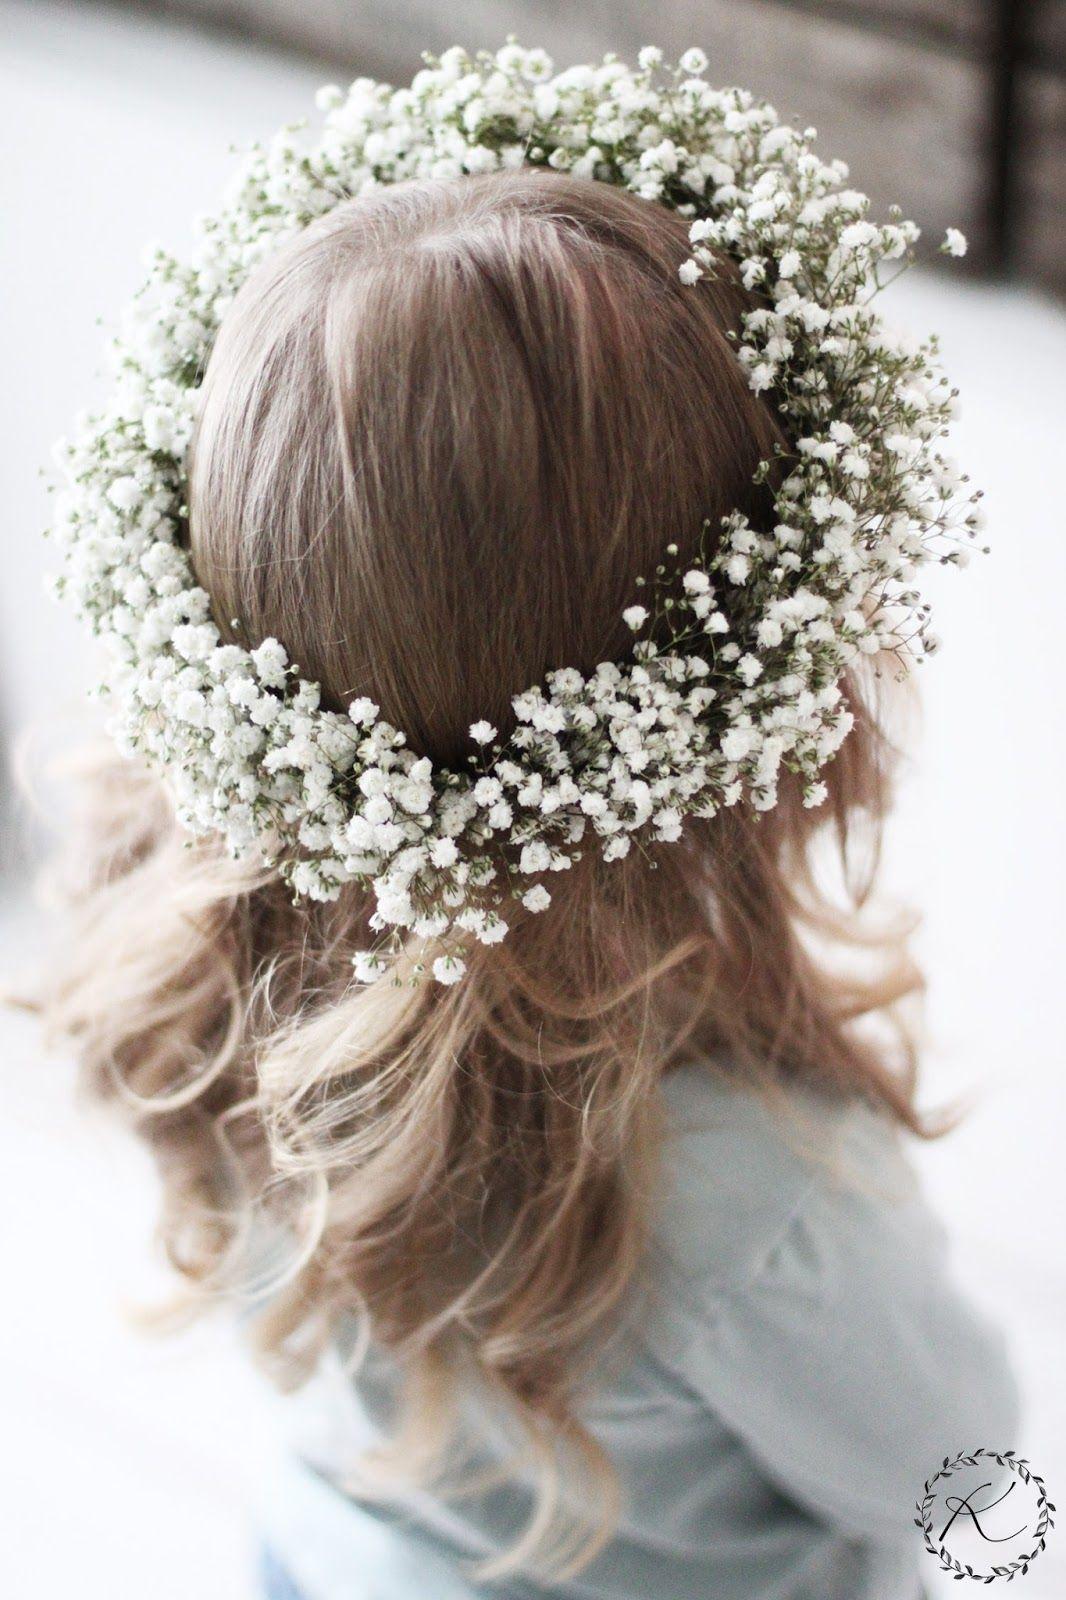 KUKKALA #kukkaseppele #flowercrown